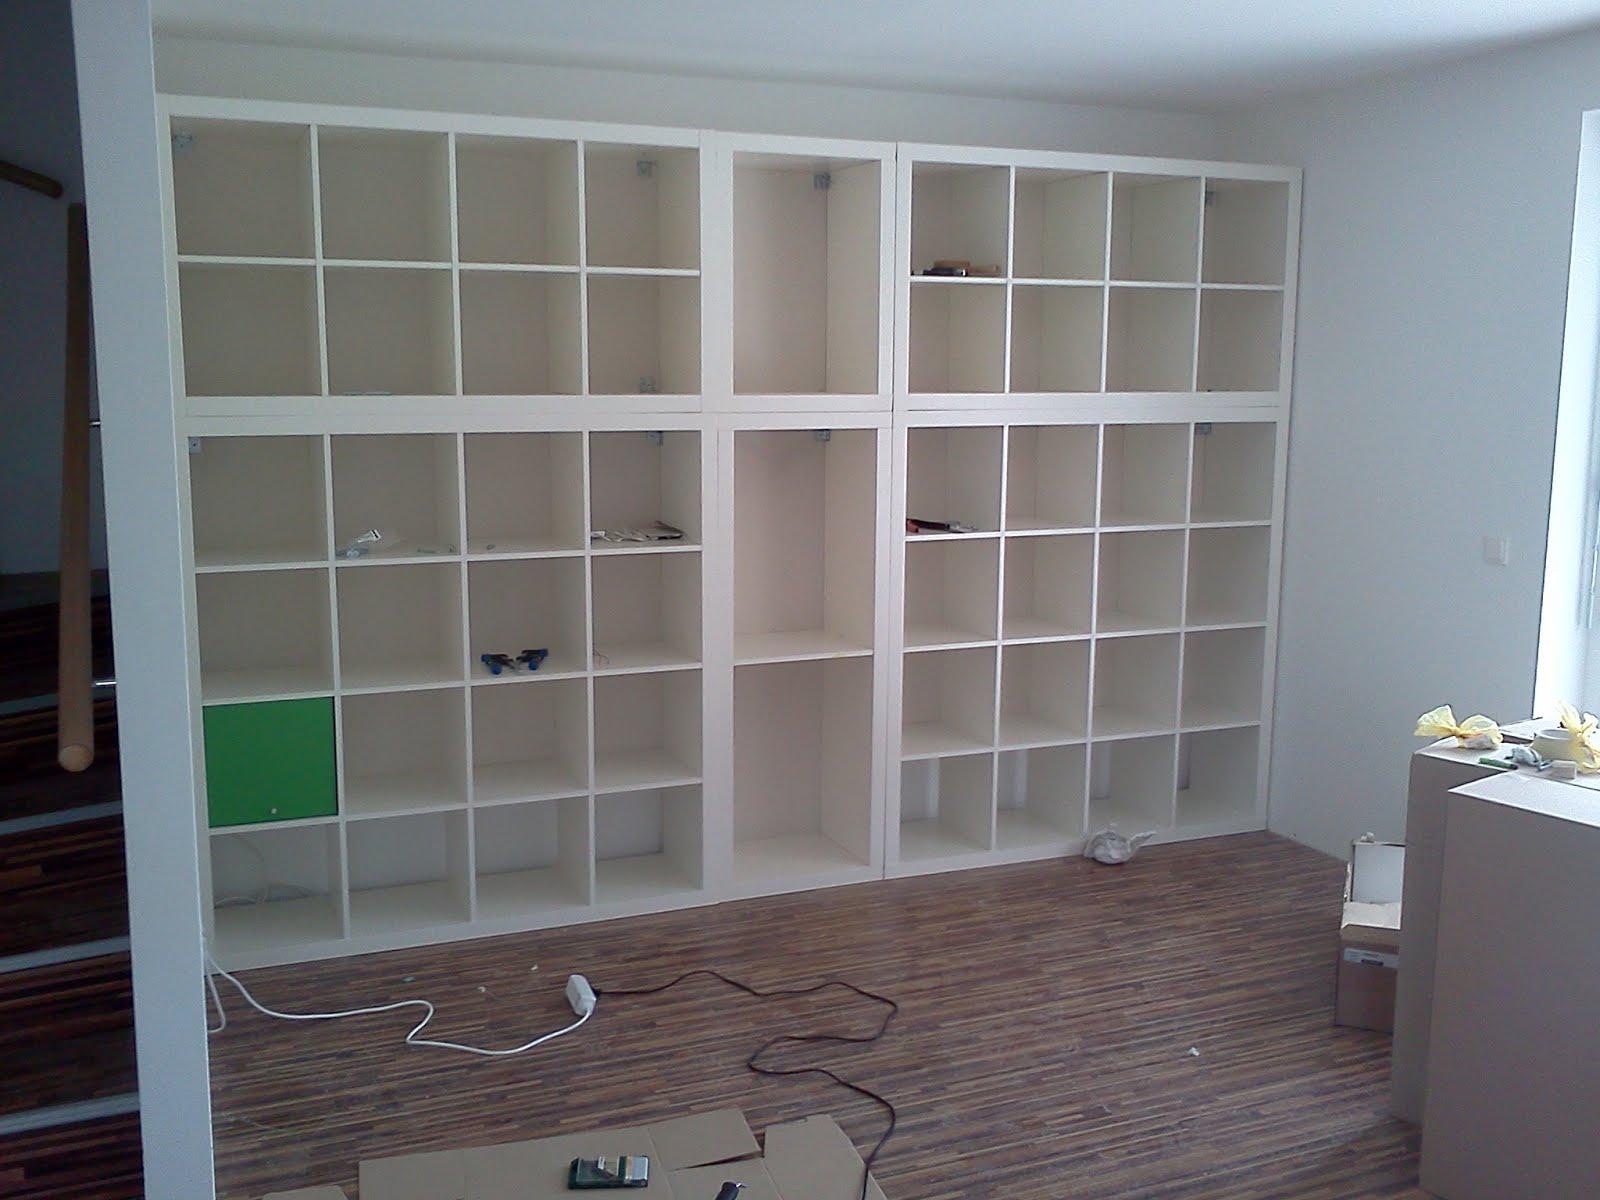 Elementaires Ikea Hack Une Bibliotheque D39angle Sur Mesure